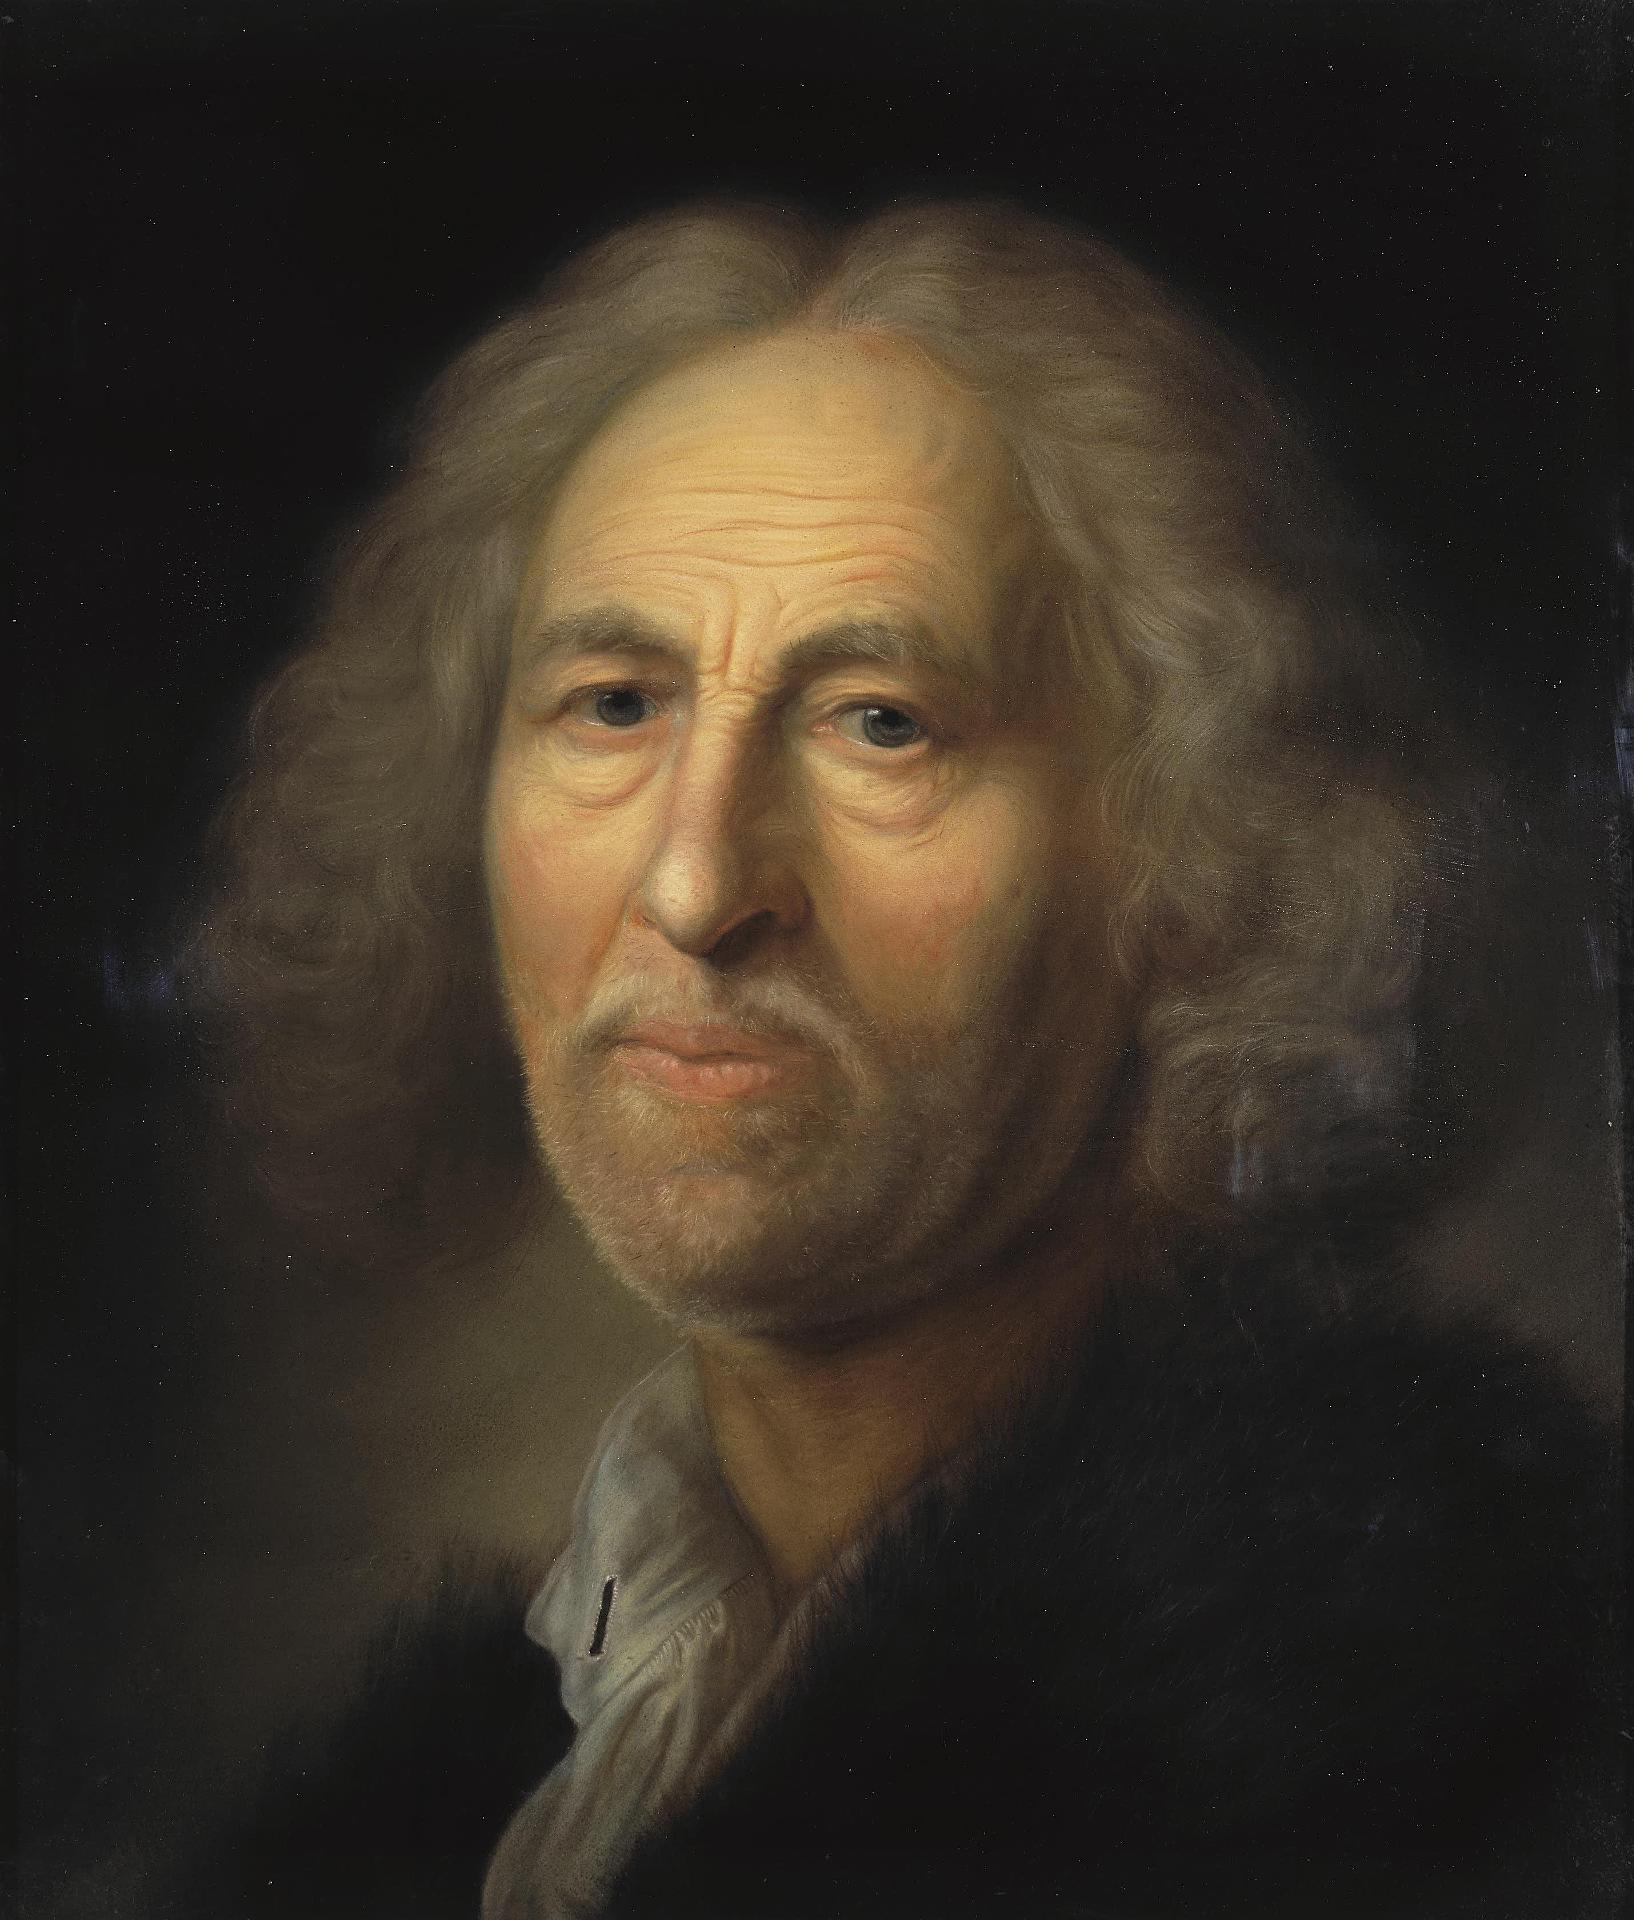 Balthasar_Denner-_Portrait_of_an_Old_Man_-_Eremitage.jpg